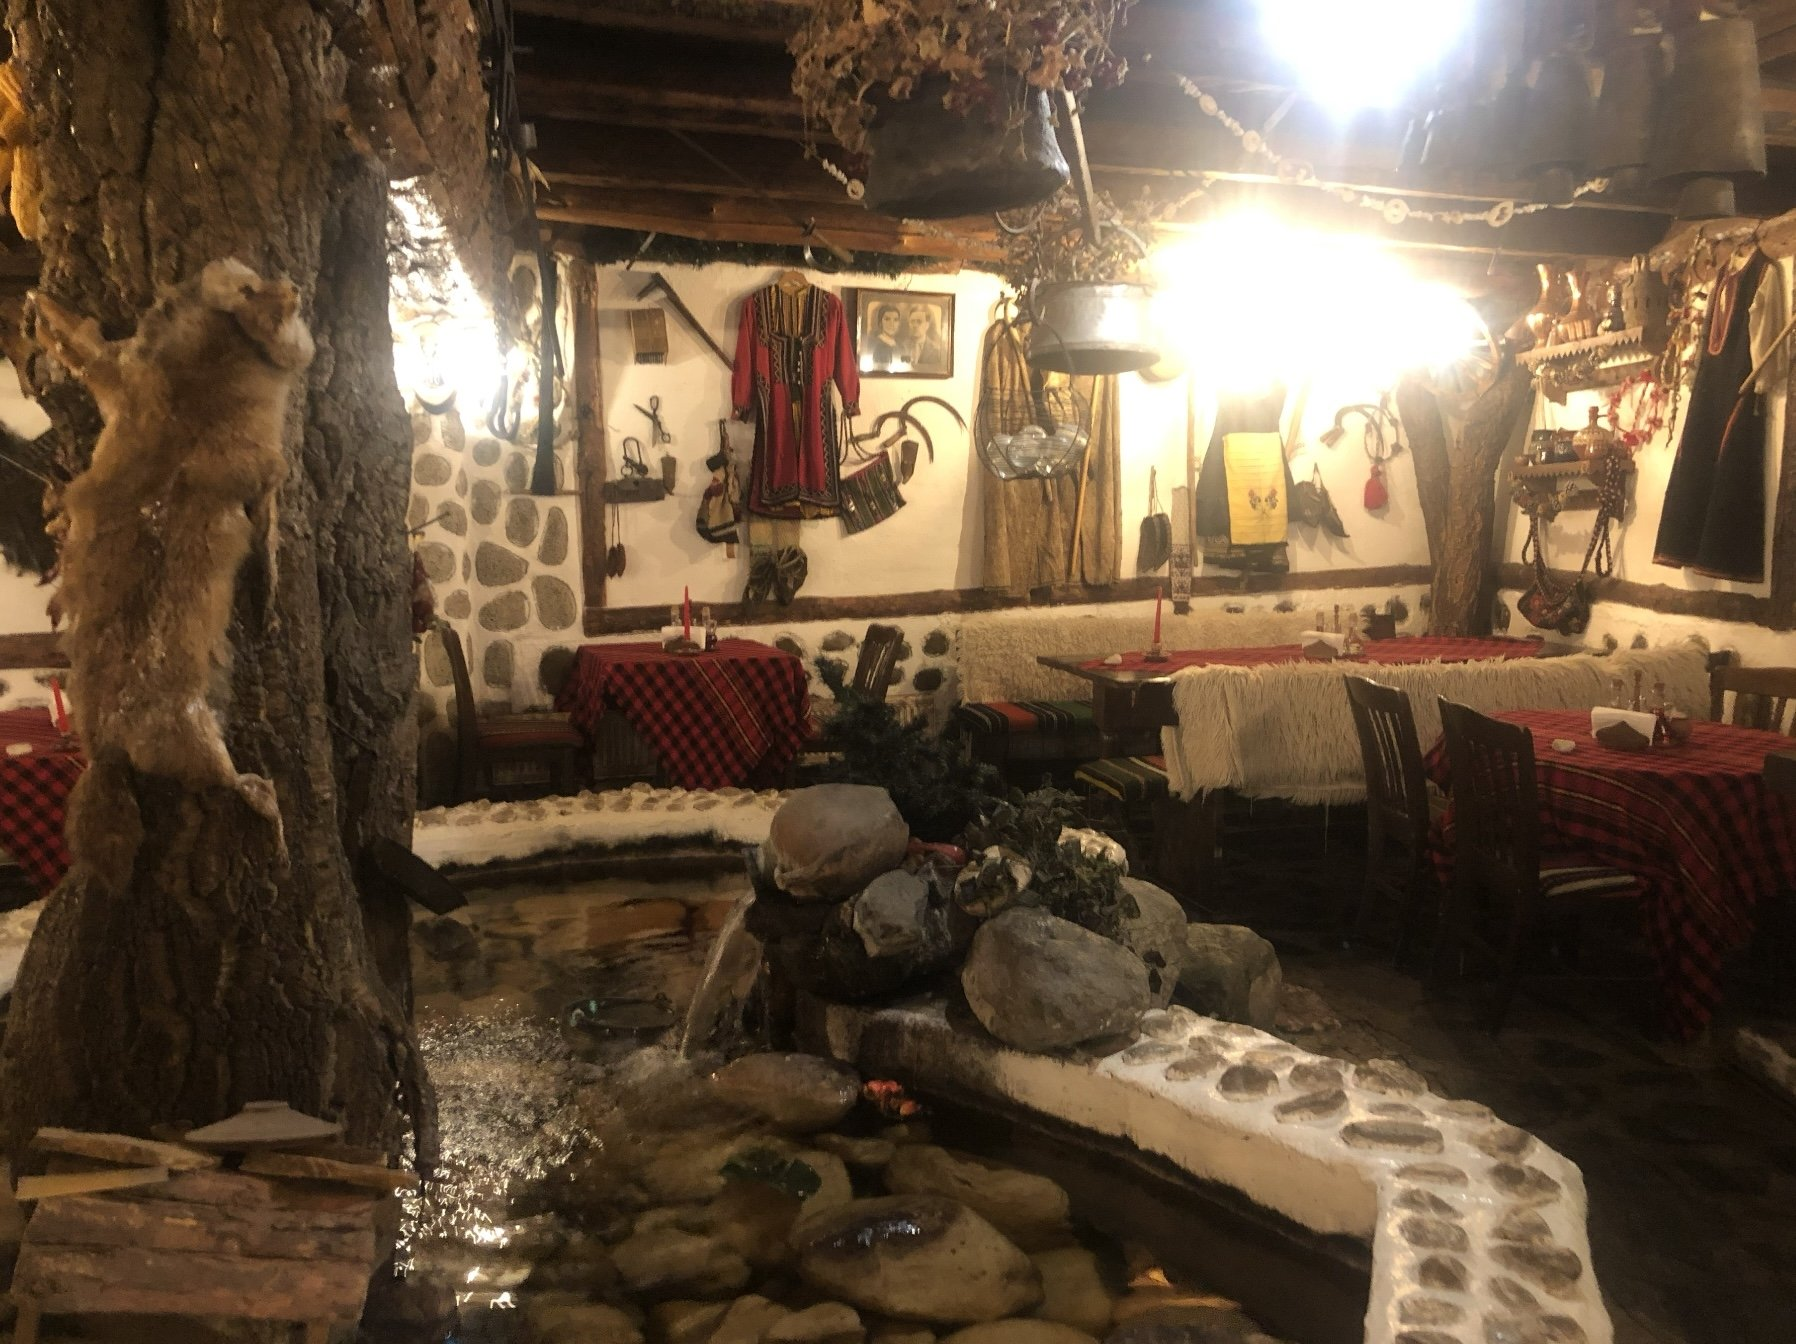 The interior of a centuries-old restaurant at Bansko, Bulgaria.